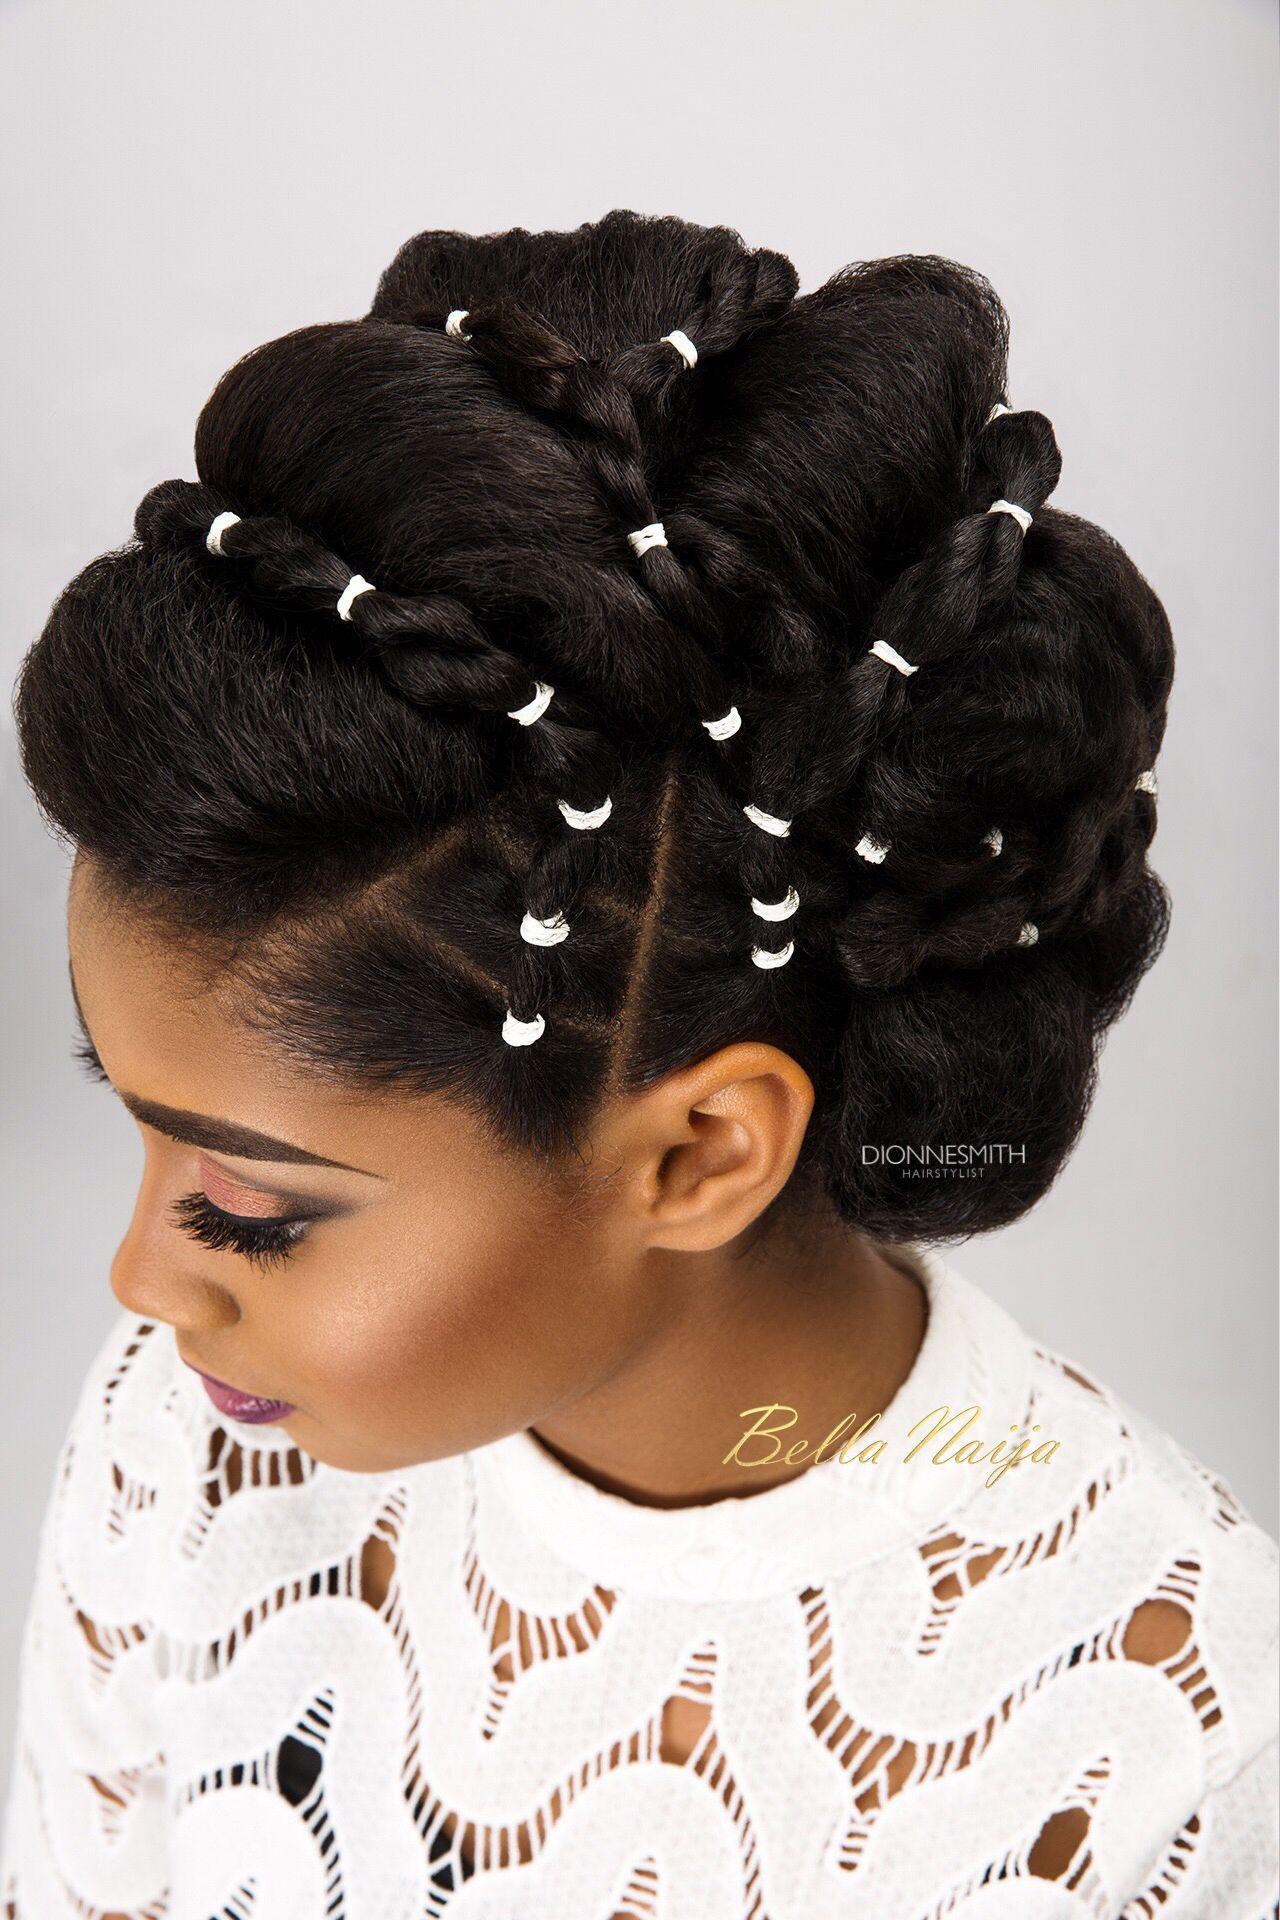 Bn Bridal Beauty International Bridal Hair Specialist Dionne Smith